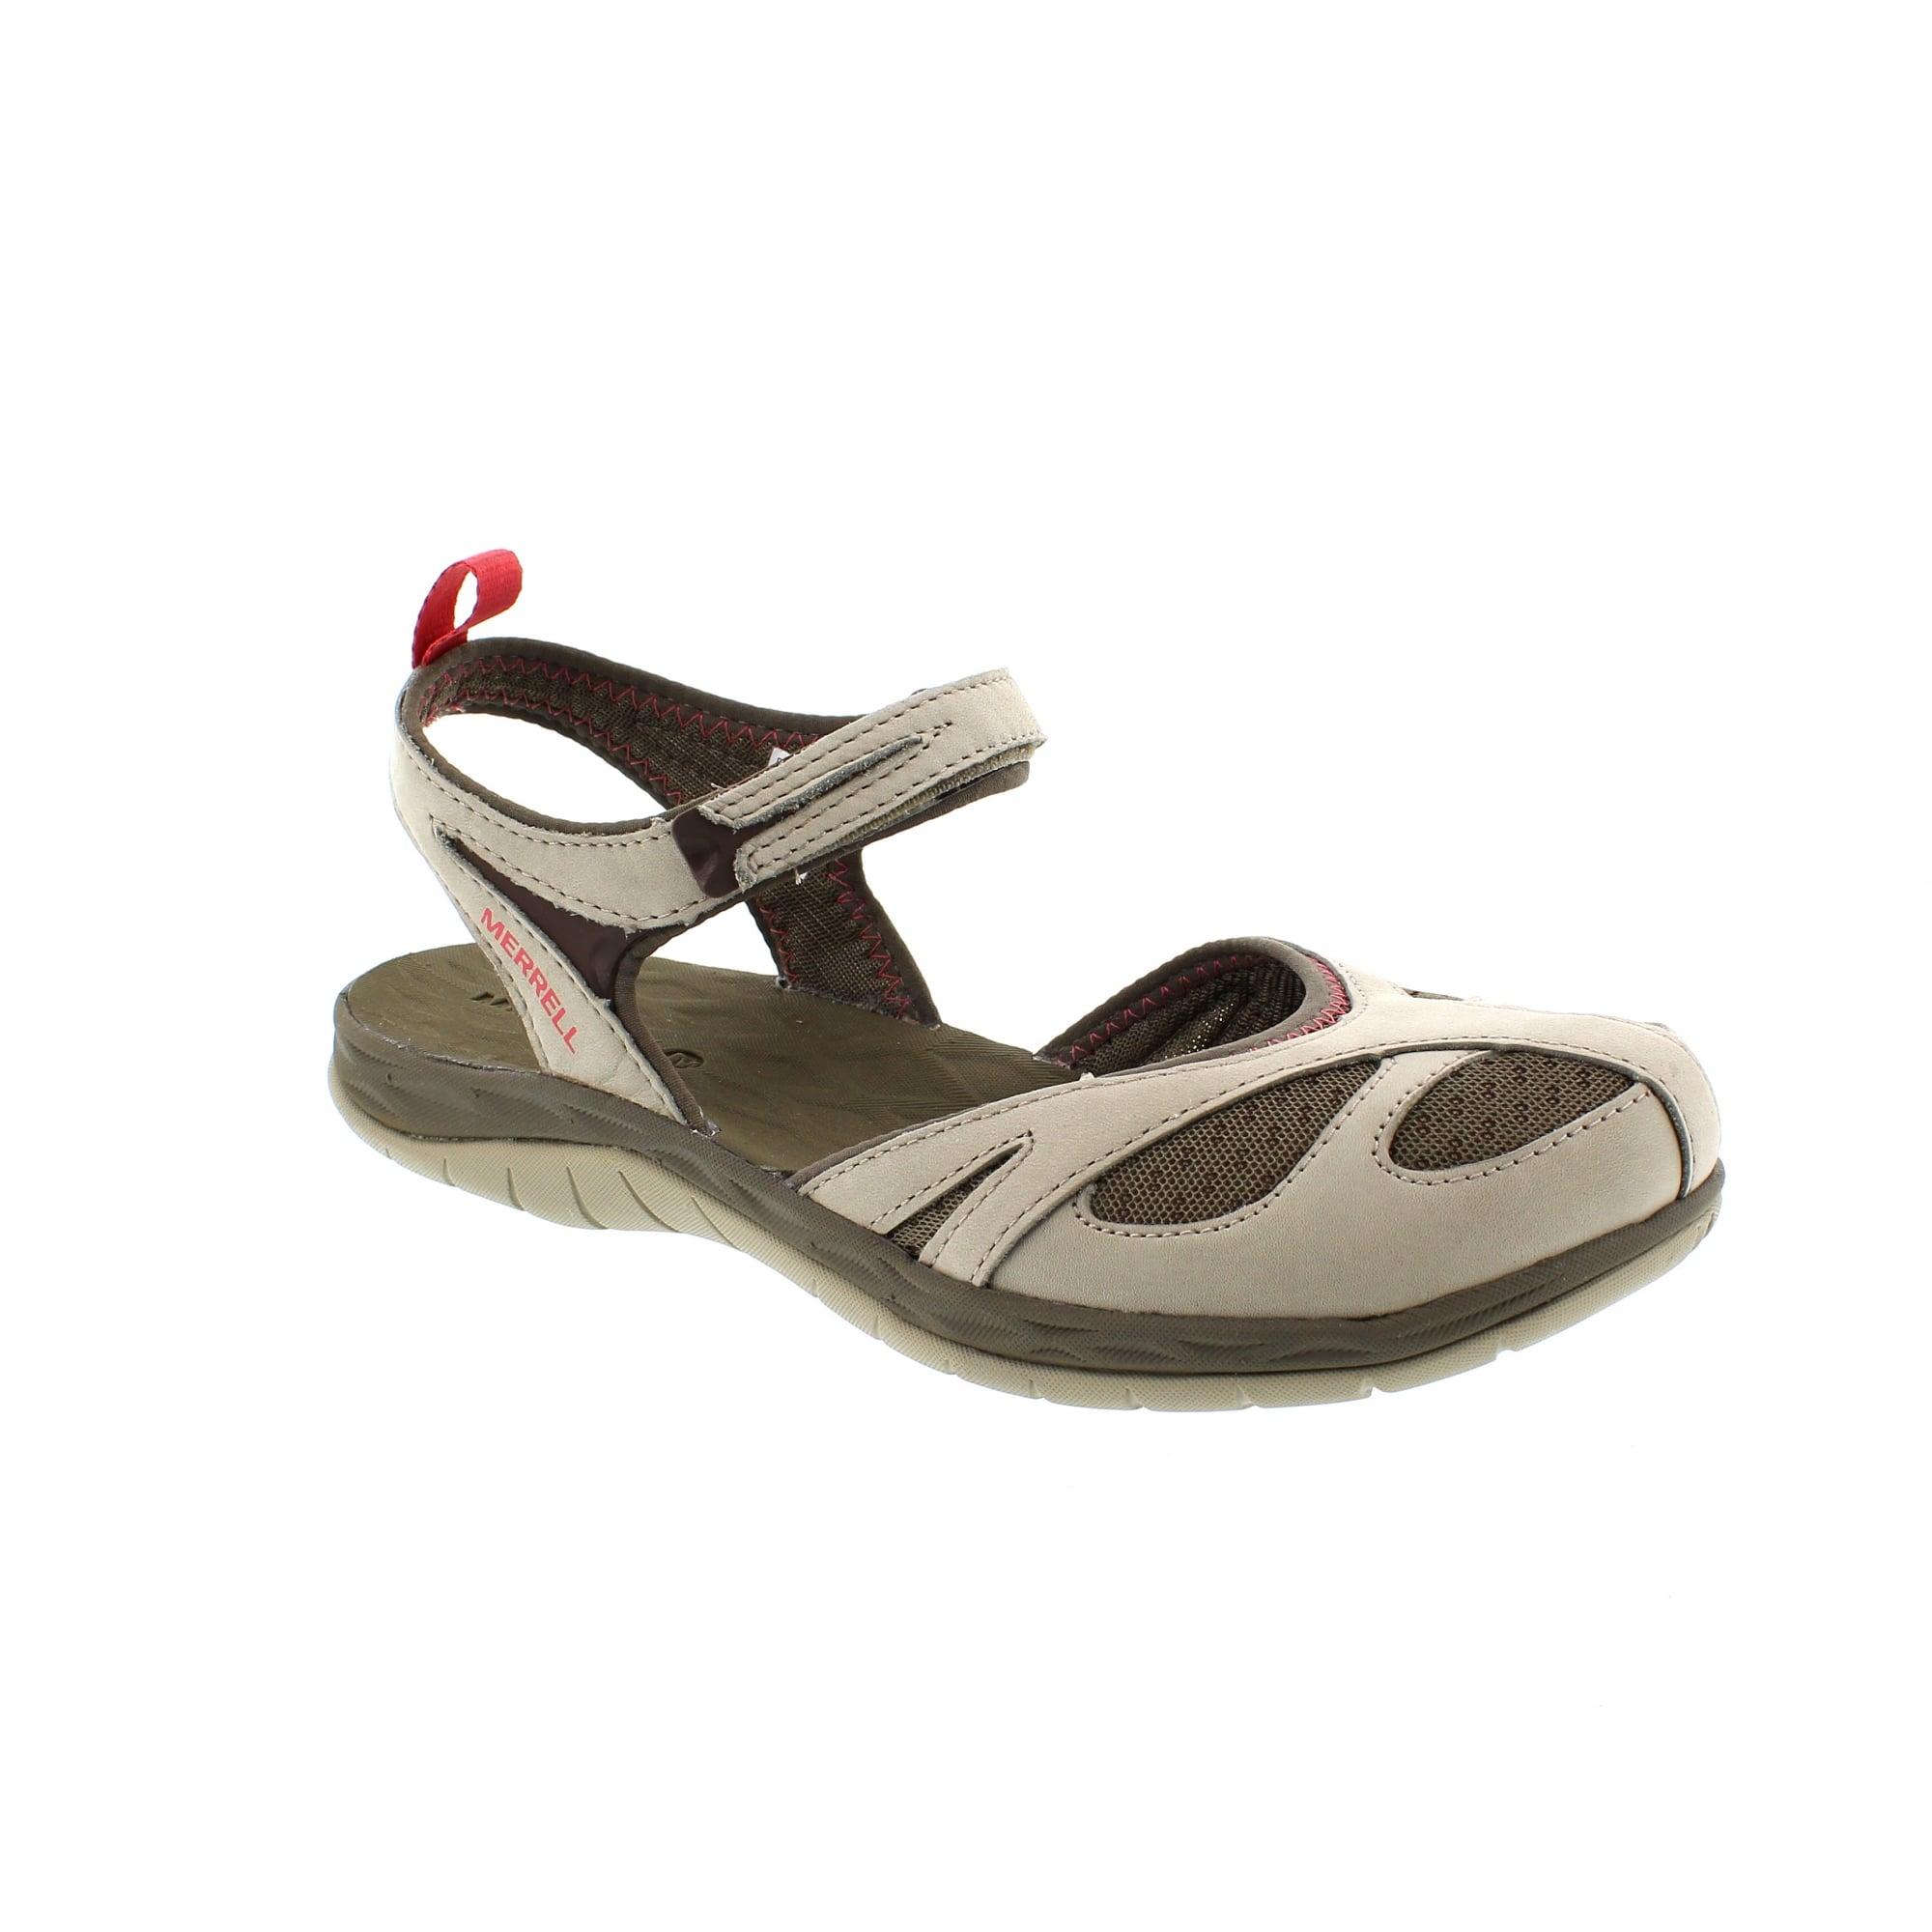 1c8a99316edf Merrell Siren Wrap Q2 J37484 Womens Walking Sandals